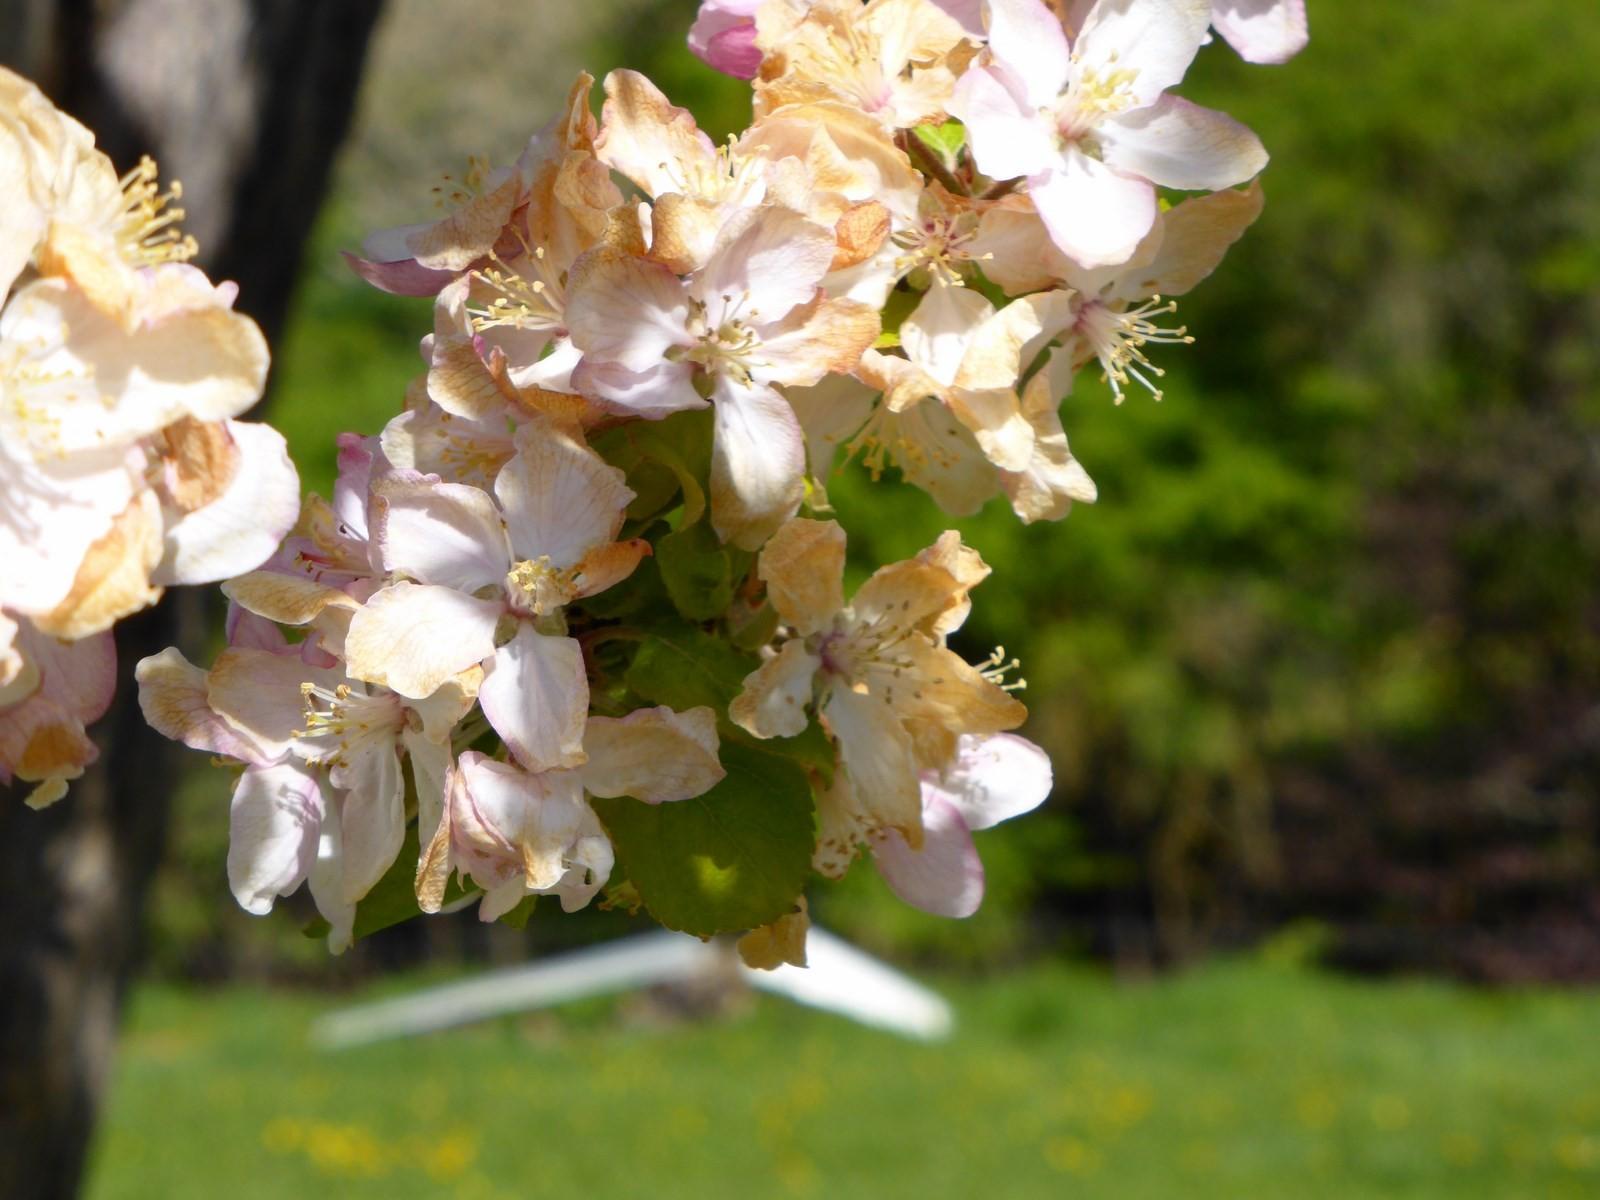 Apfelblüte © Hartmut Hermanns